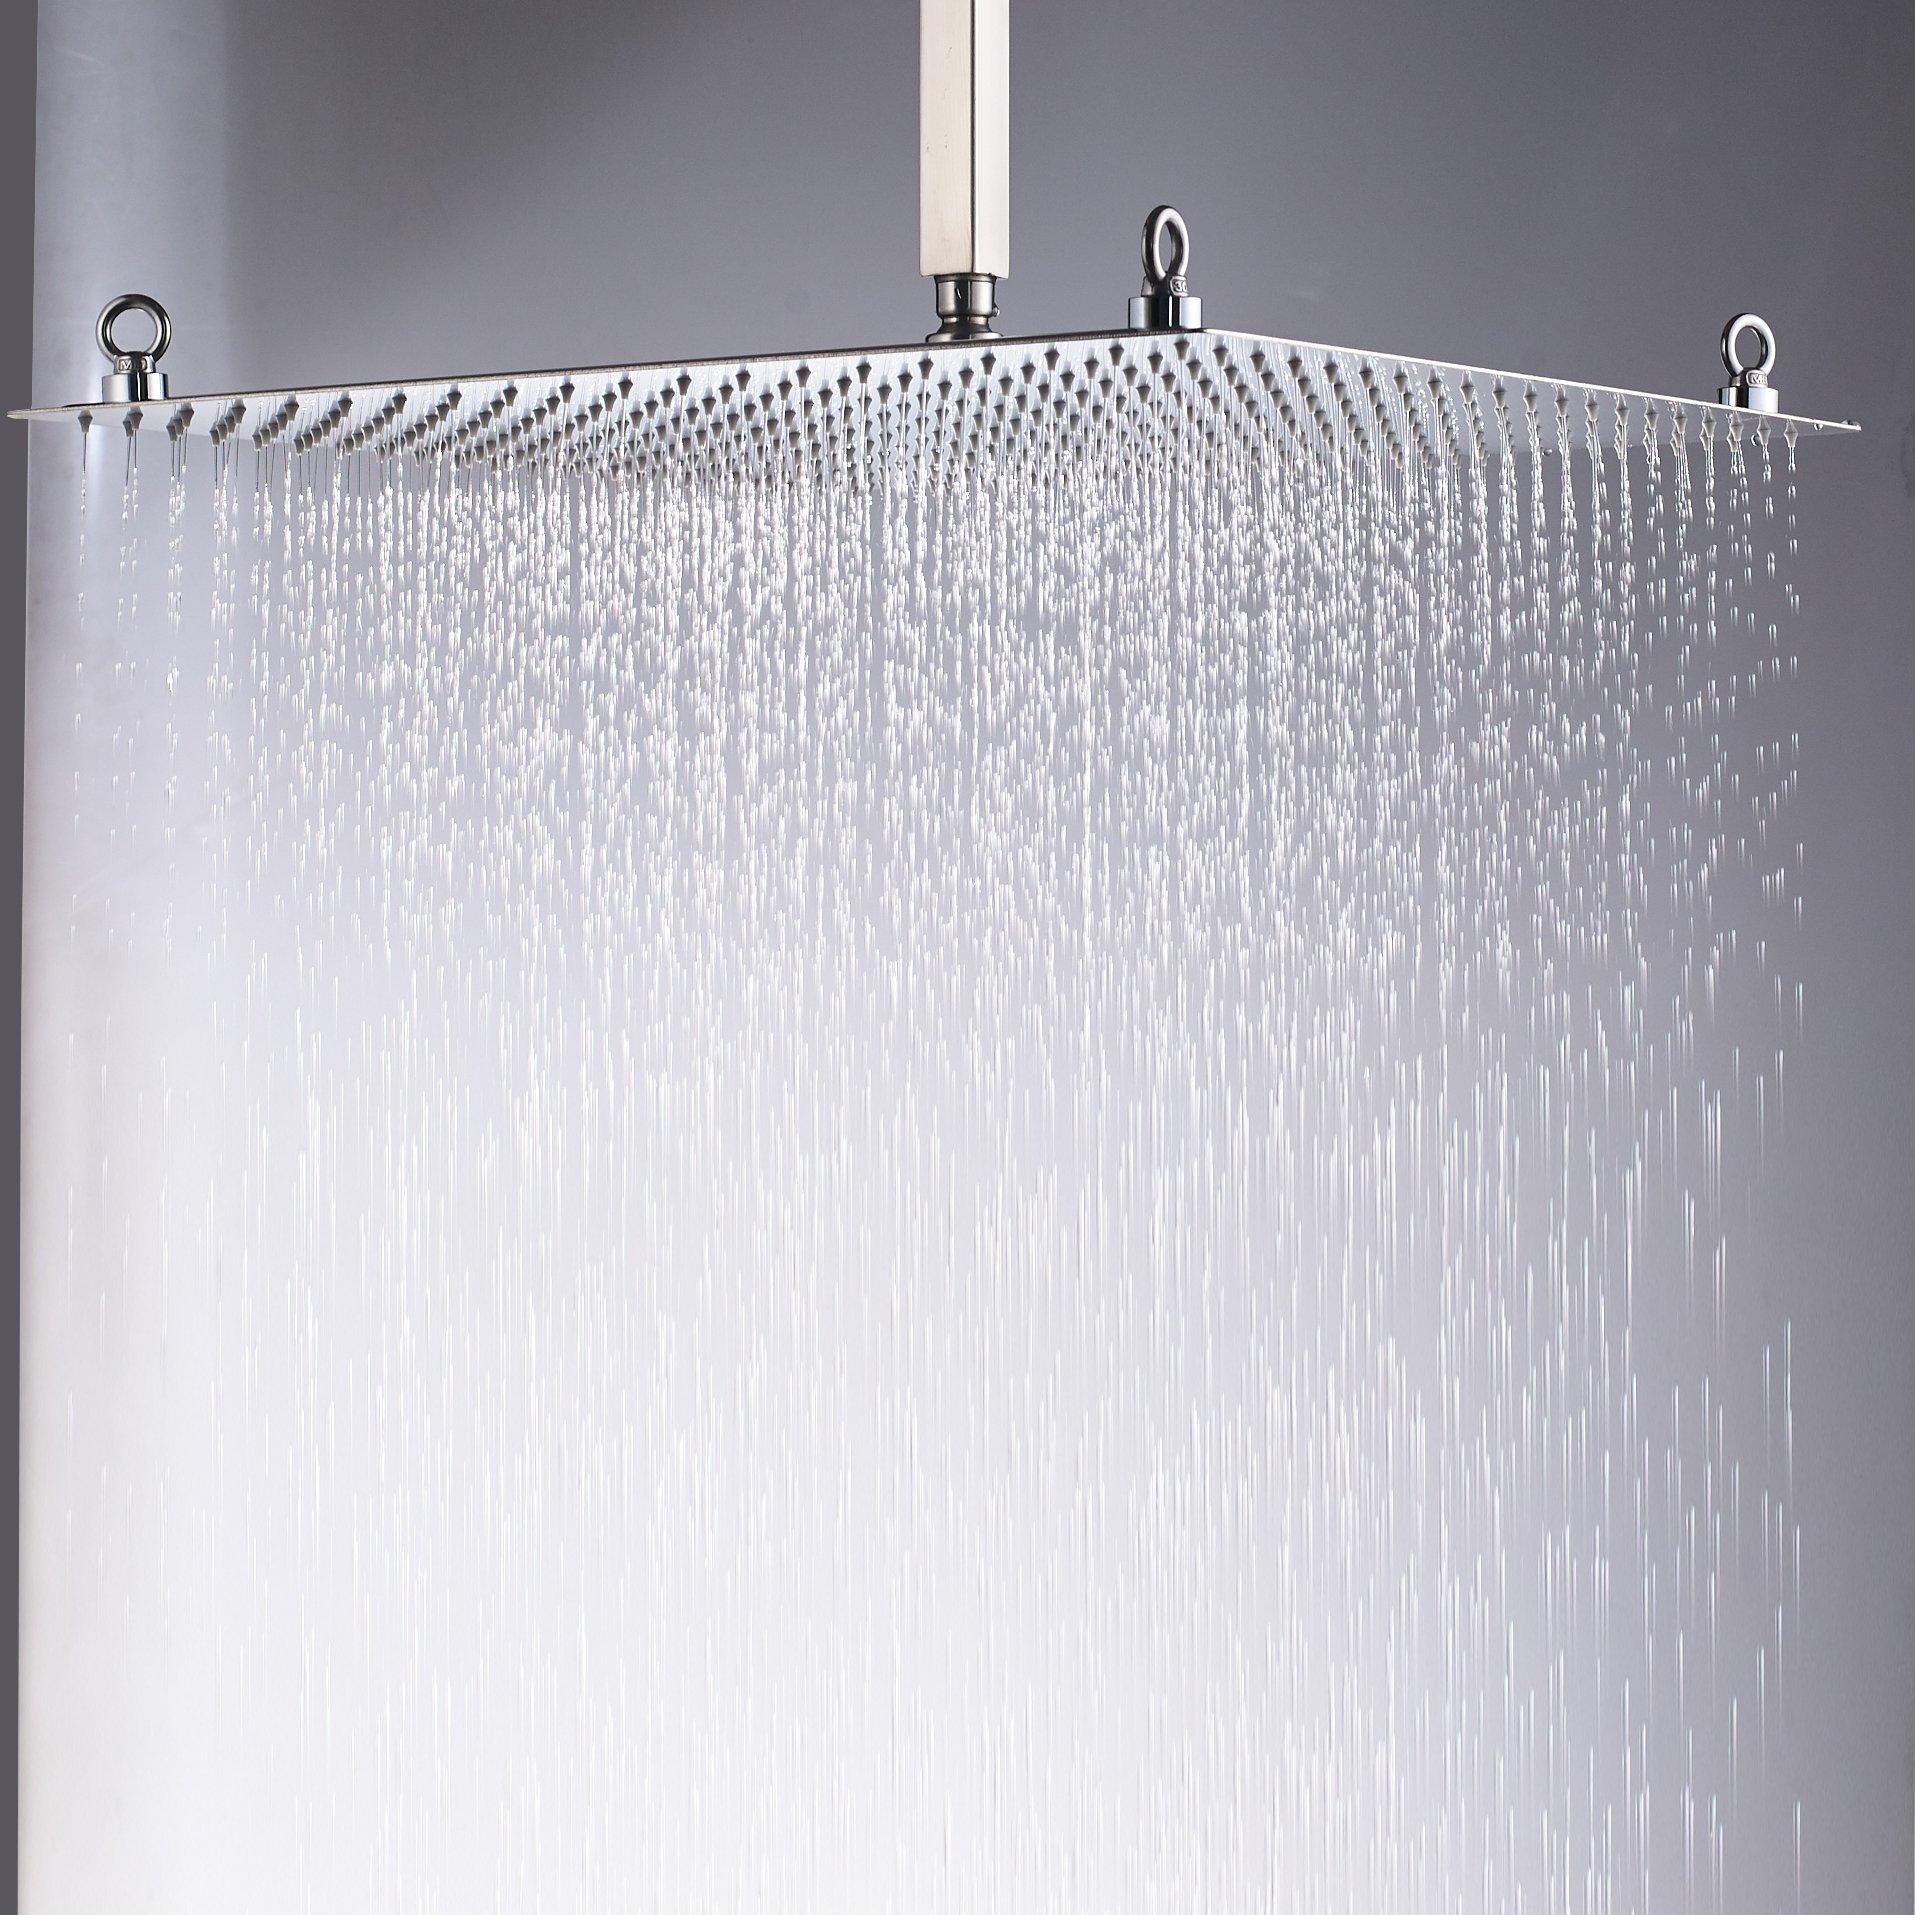 Rozin Bathroom Square 20-inch Rainfall Top Shower Head Overhead Spray Brushed Nickel